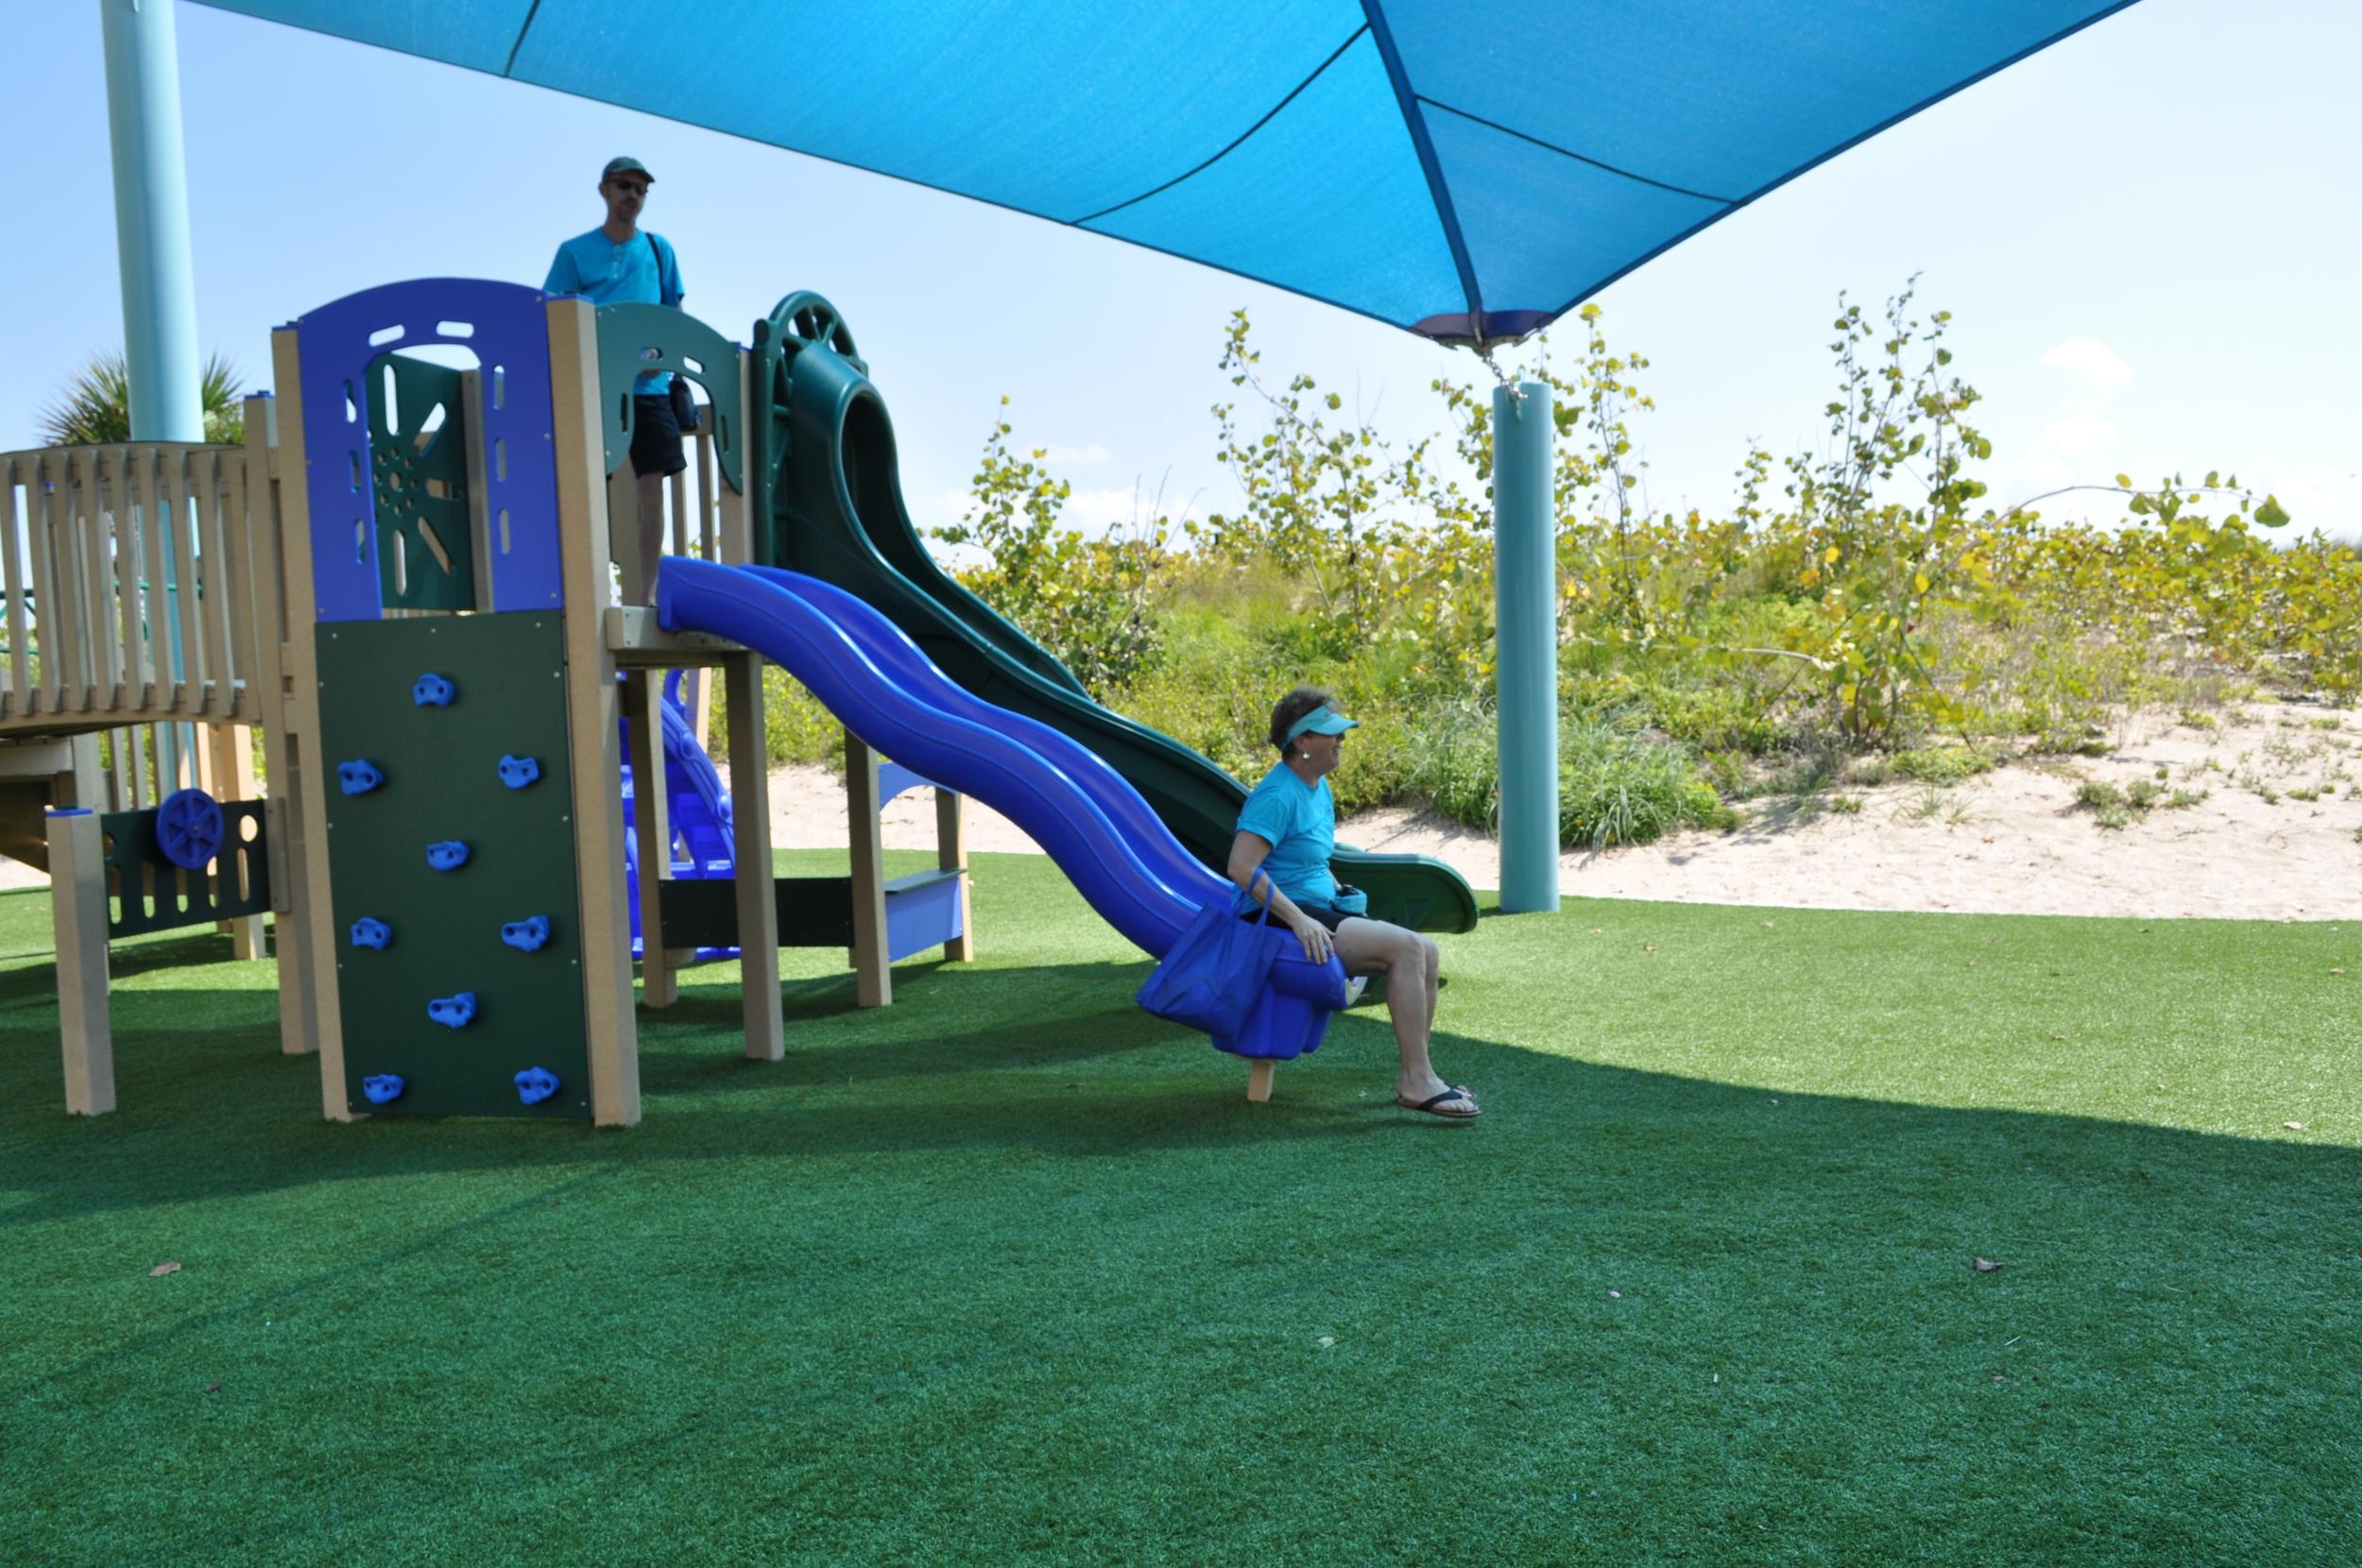 City of Riviera Beach Municipal Beach Park Ocean Mall Play Structure in Shade.jpg